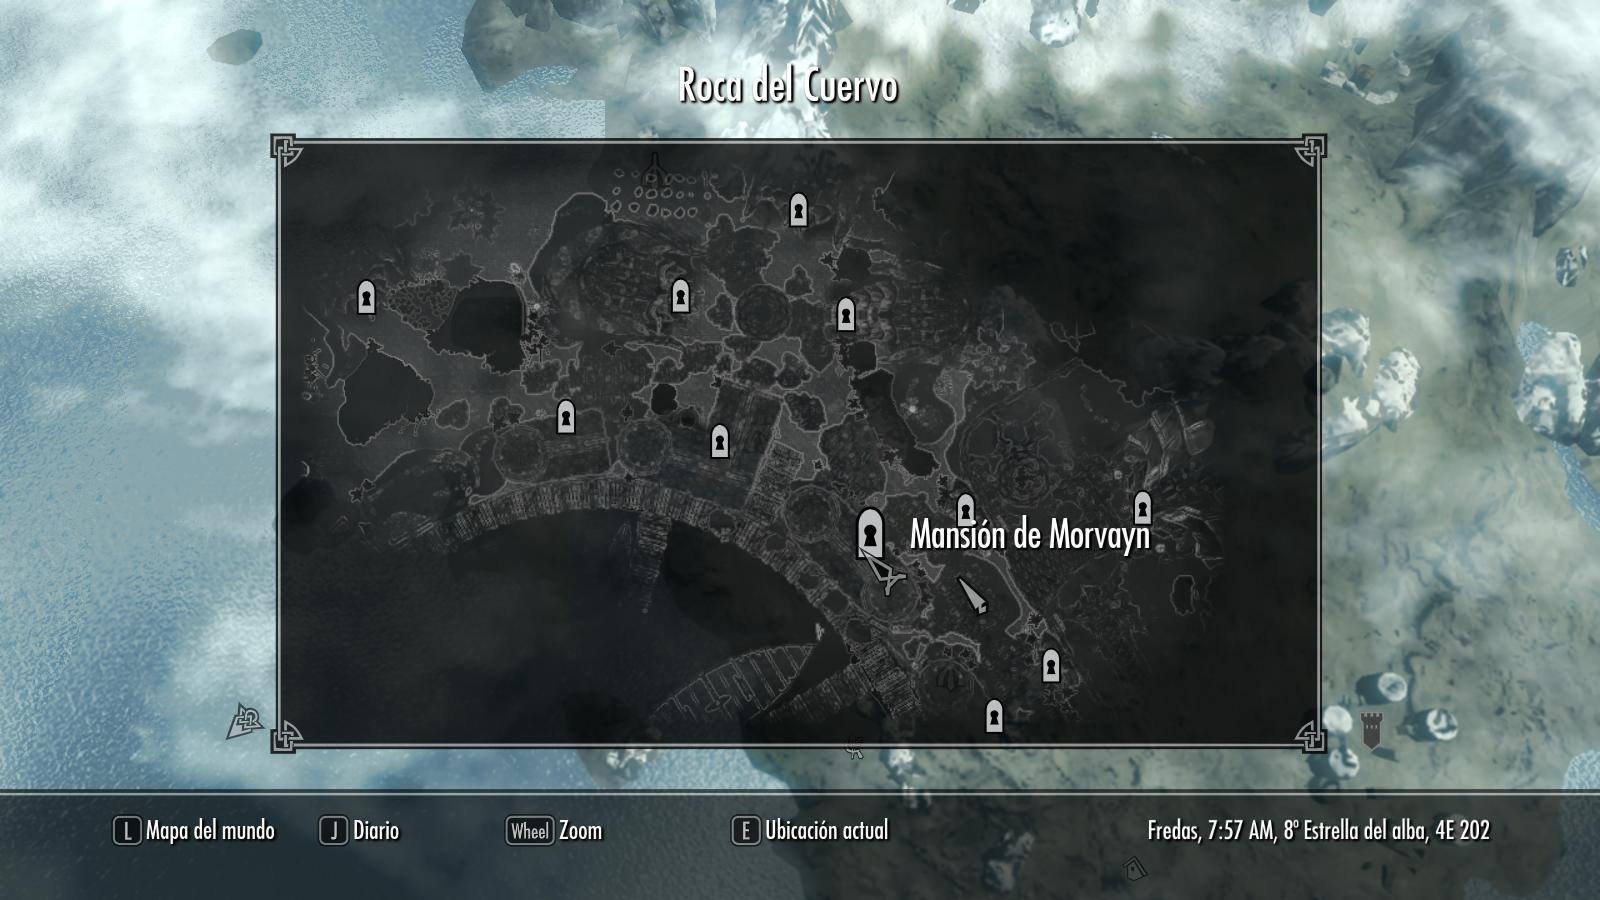 Mansión de Morvayn